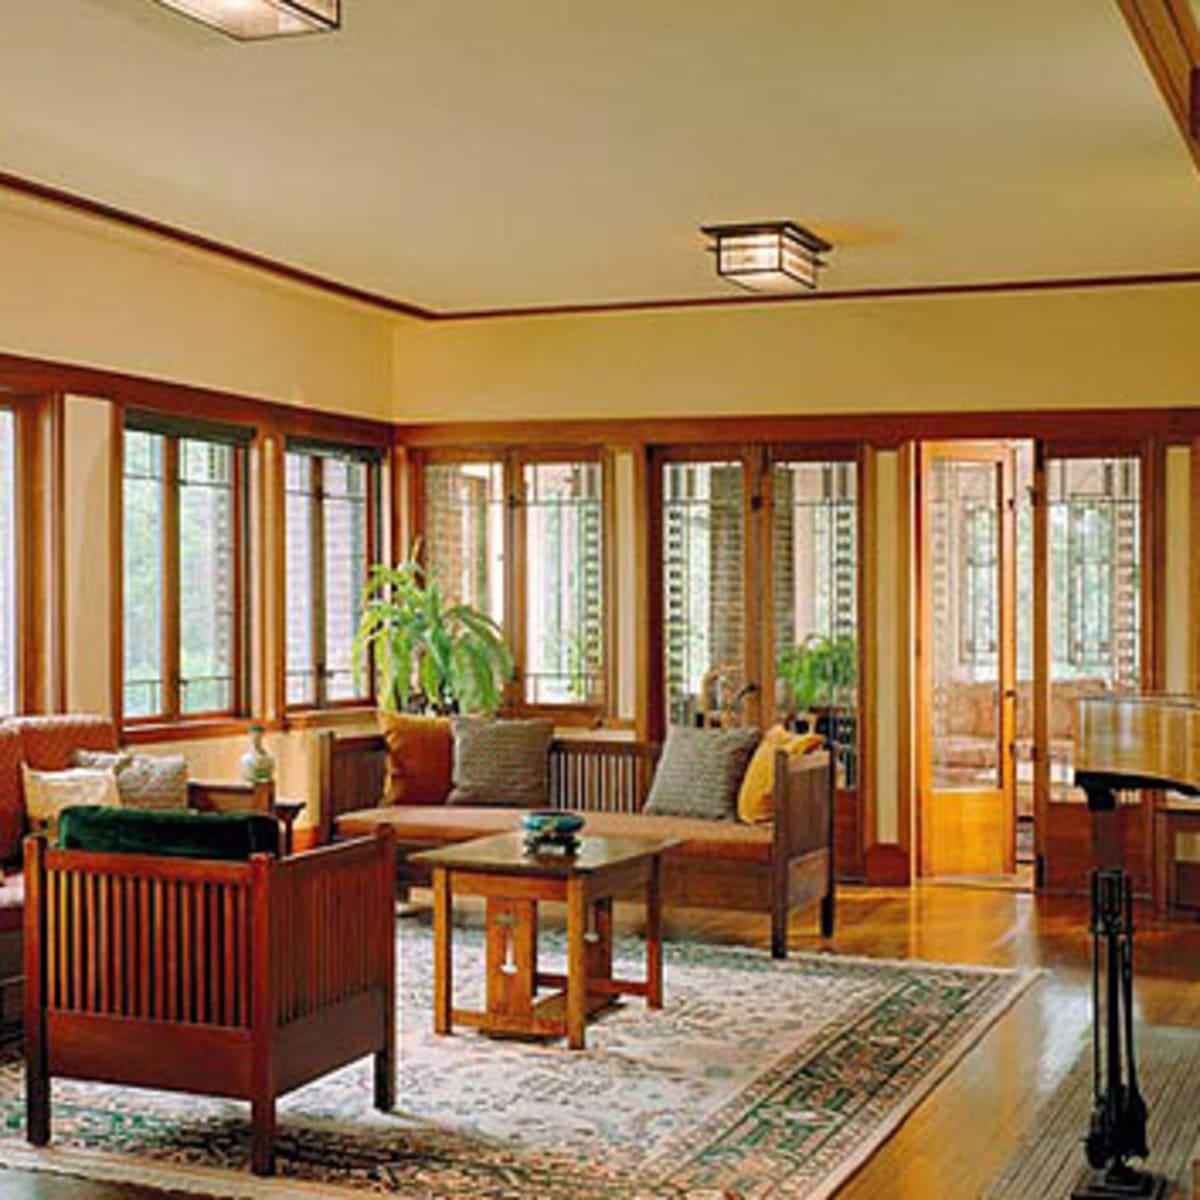 Early Prairie School Interior Design